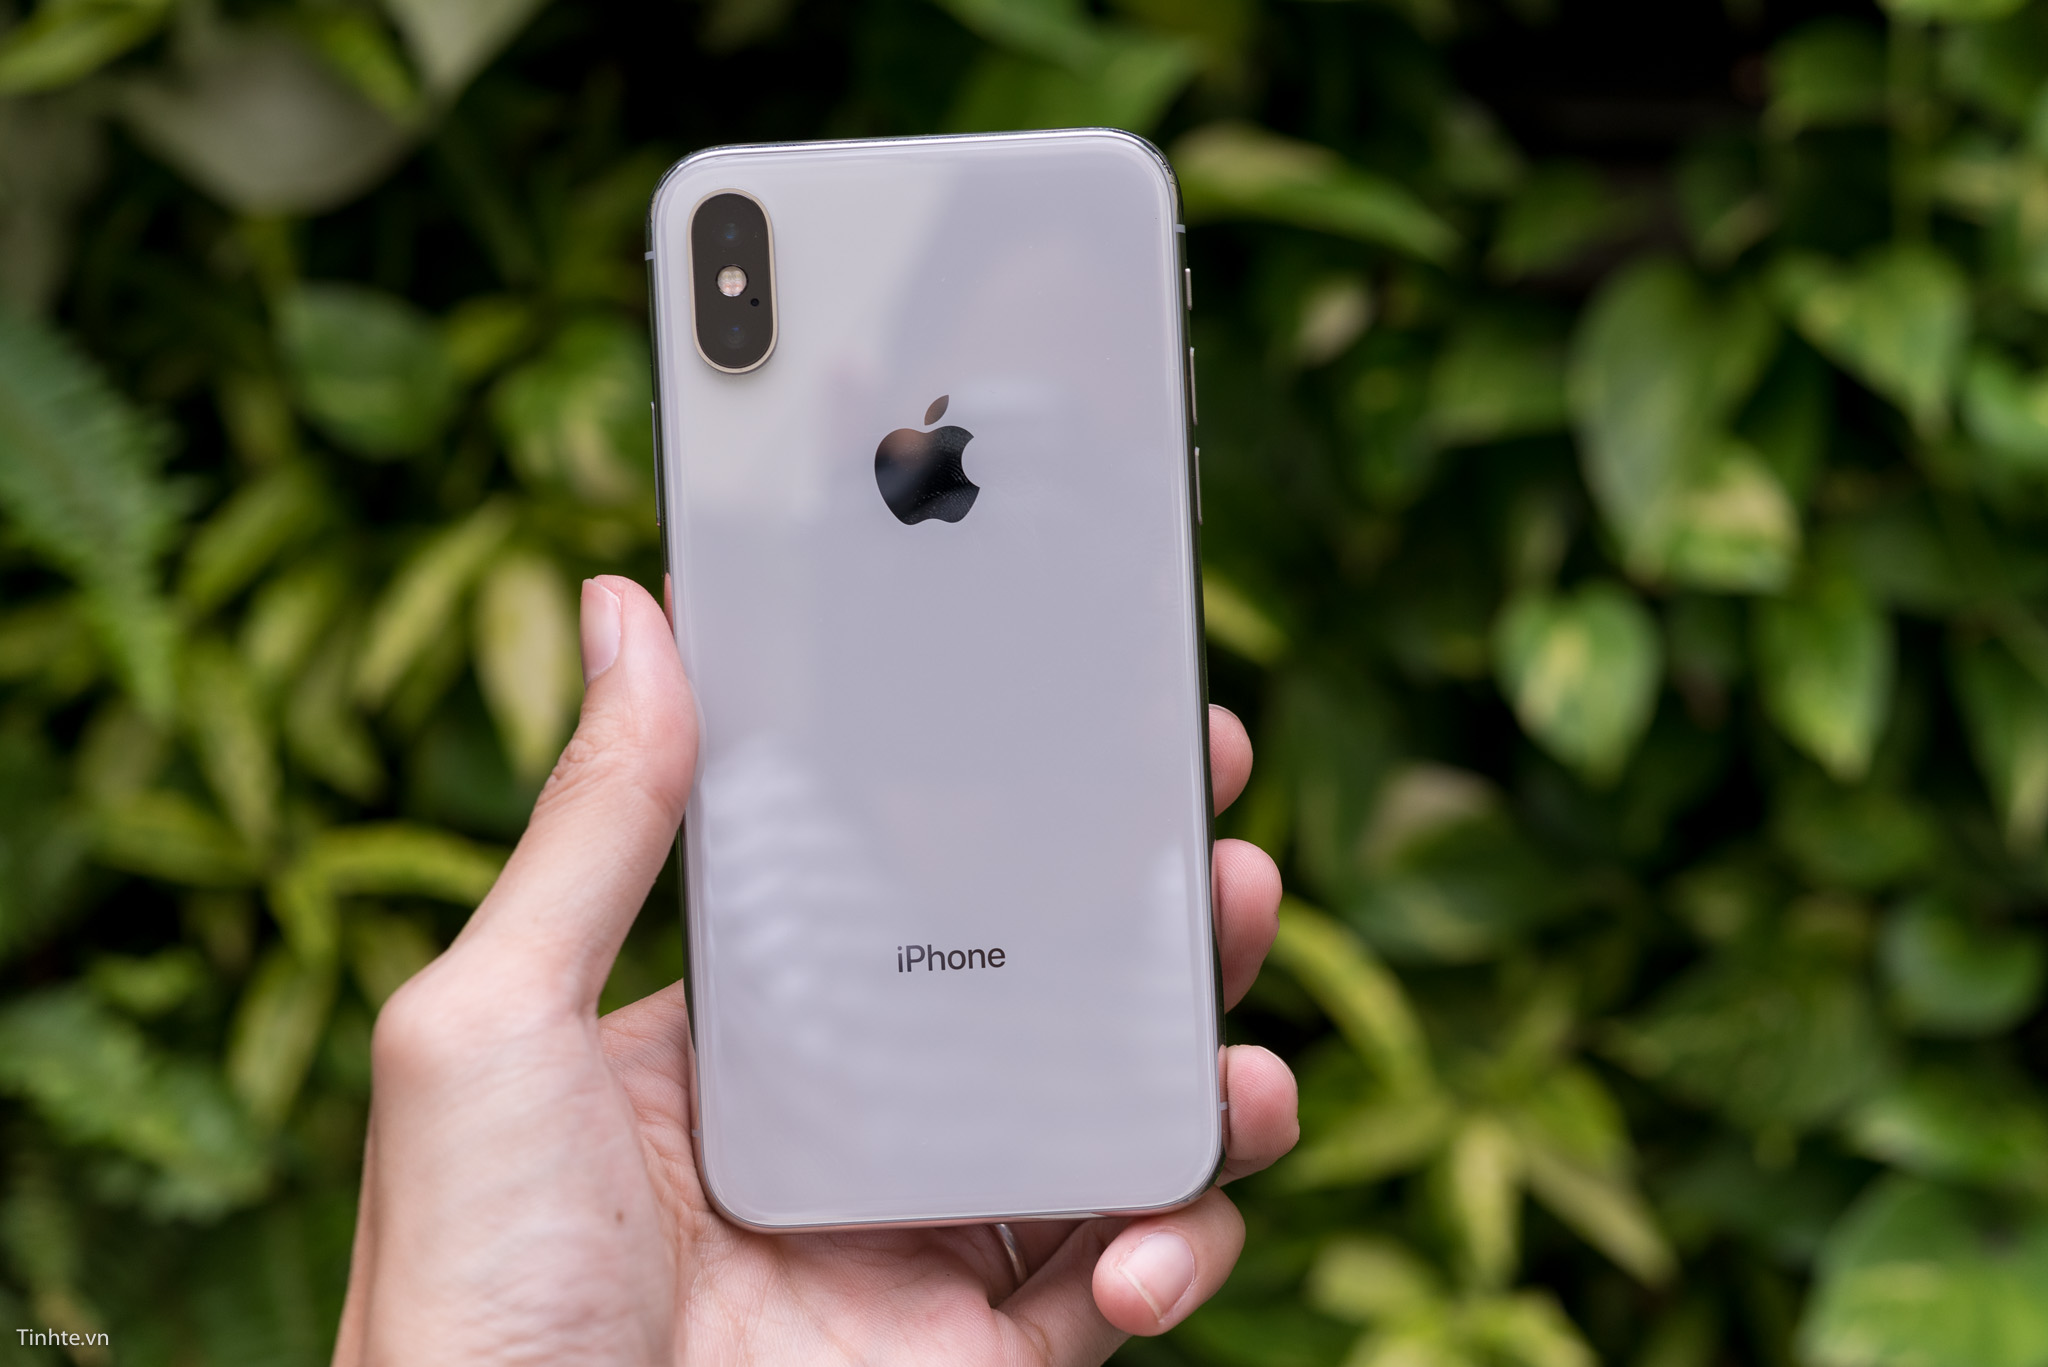 iphonex-s8-tinhte-11.jpg